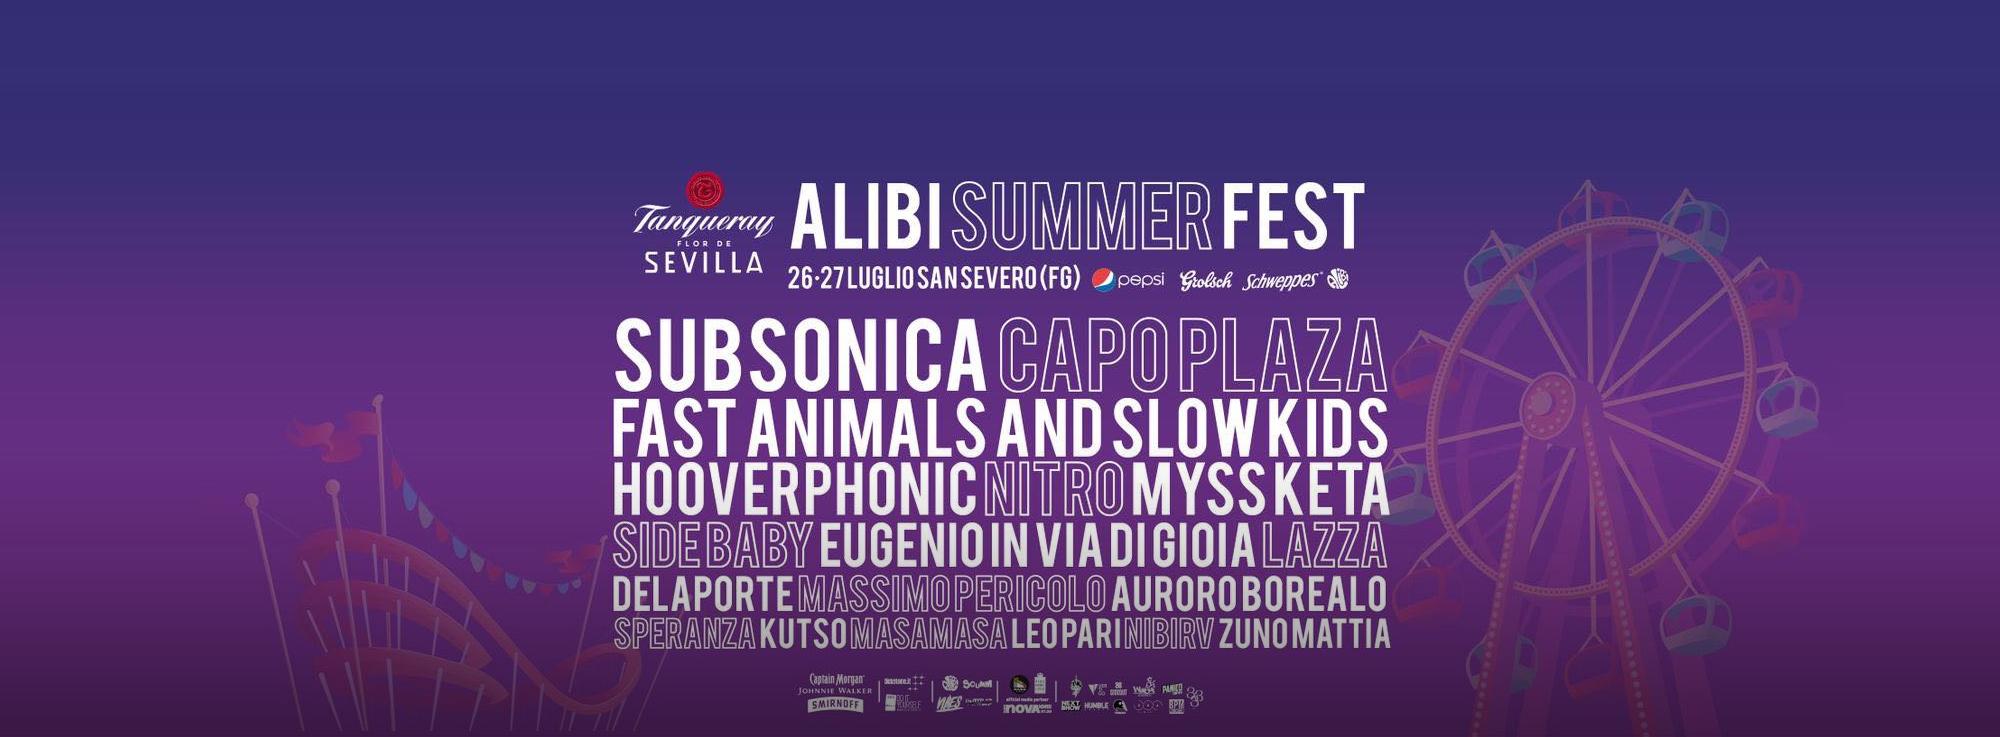 San Severo: Alibi Summer Fest